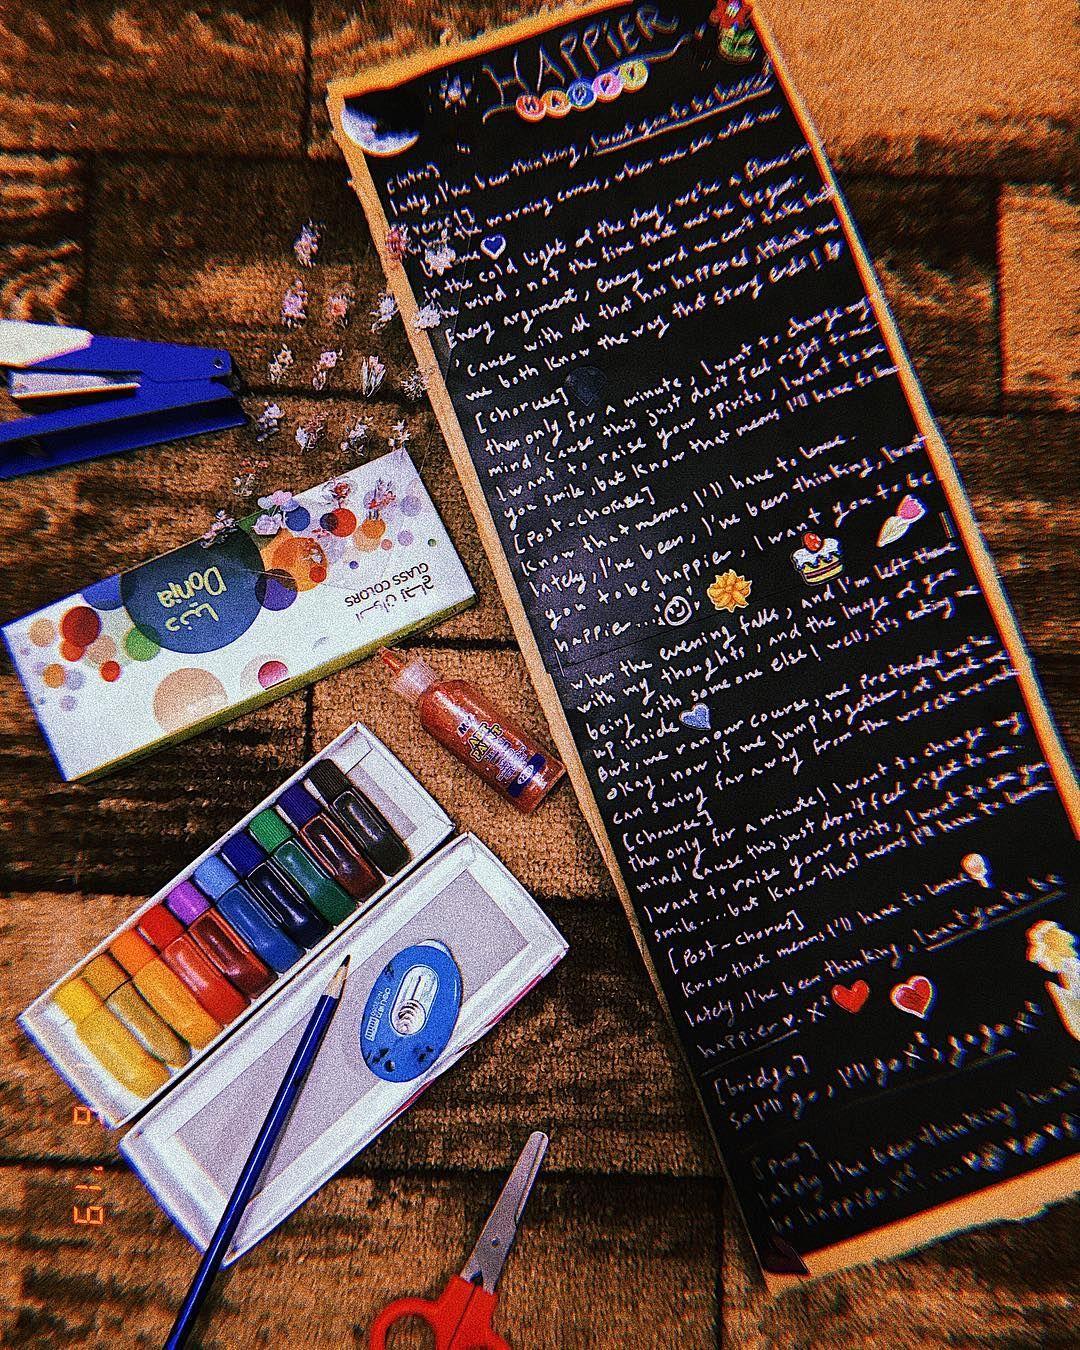 happier by marshmello ft bastille  is such a beautiful song. #crafting#colors#happier#marshmello#bastille#lyrics#diy#vintage#aesthetic#black #photography #retro#ig_masterpiece#ig_shotz #main_vision #master_shots #exclusive_shots#pixel_ig#photographyislife#worldbestgram  #iglobal_photographers #ig_great_pics #ig_myshot#shotwithlove#icatching#collectivelycreate#wow#handmade#art#inspiration